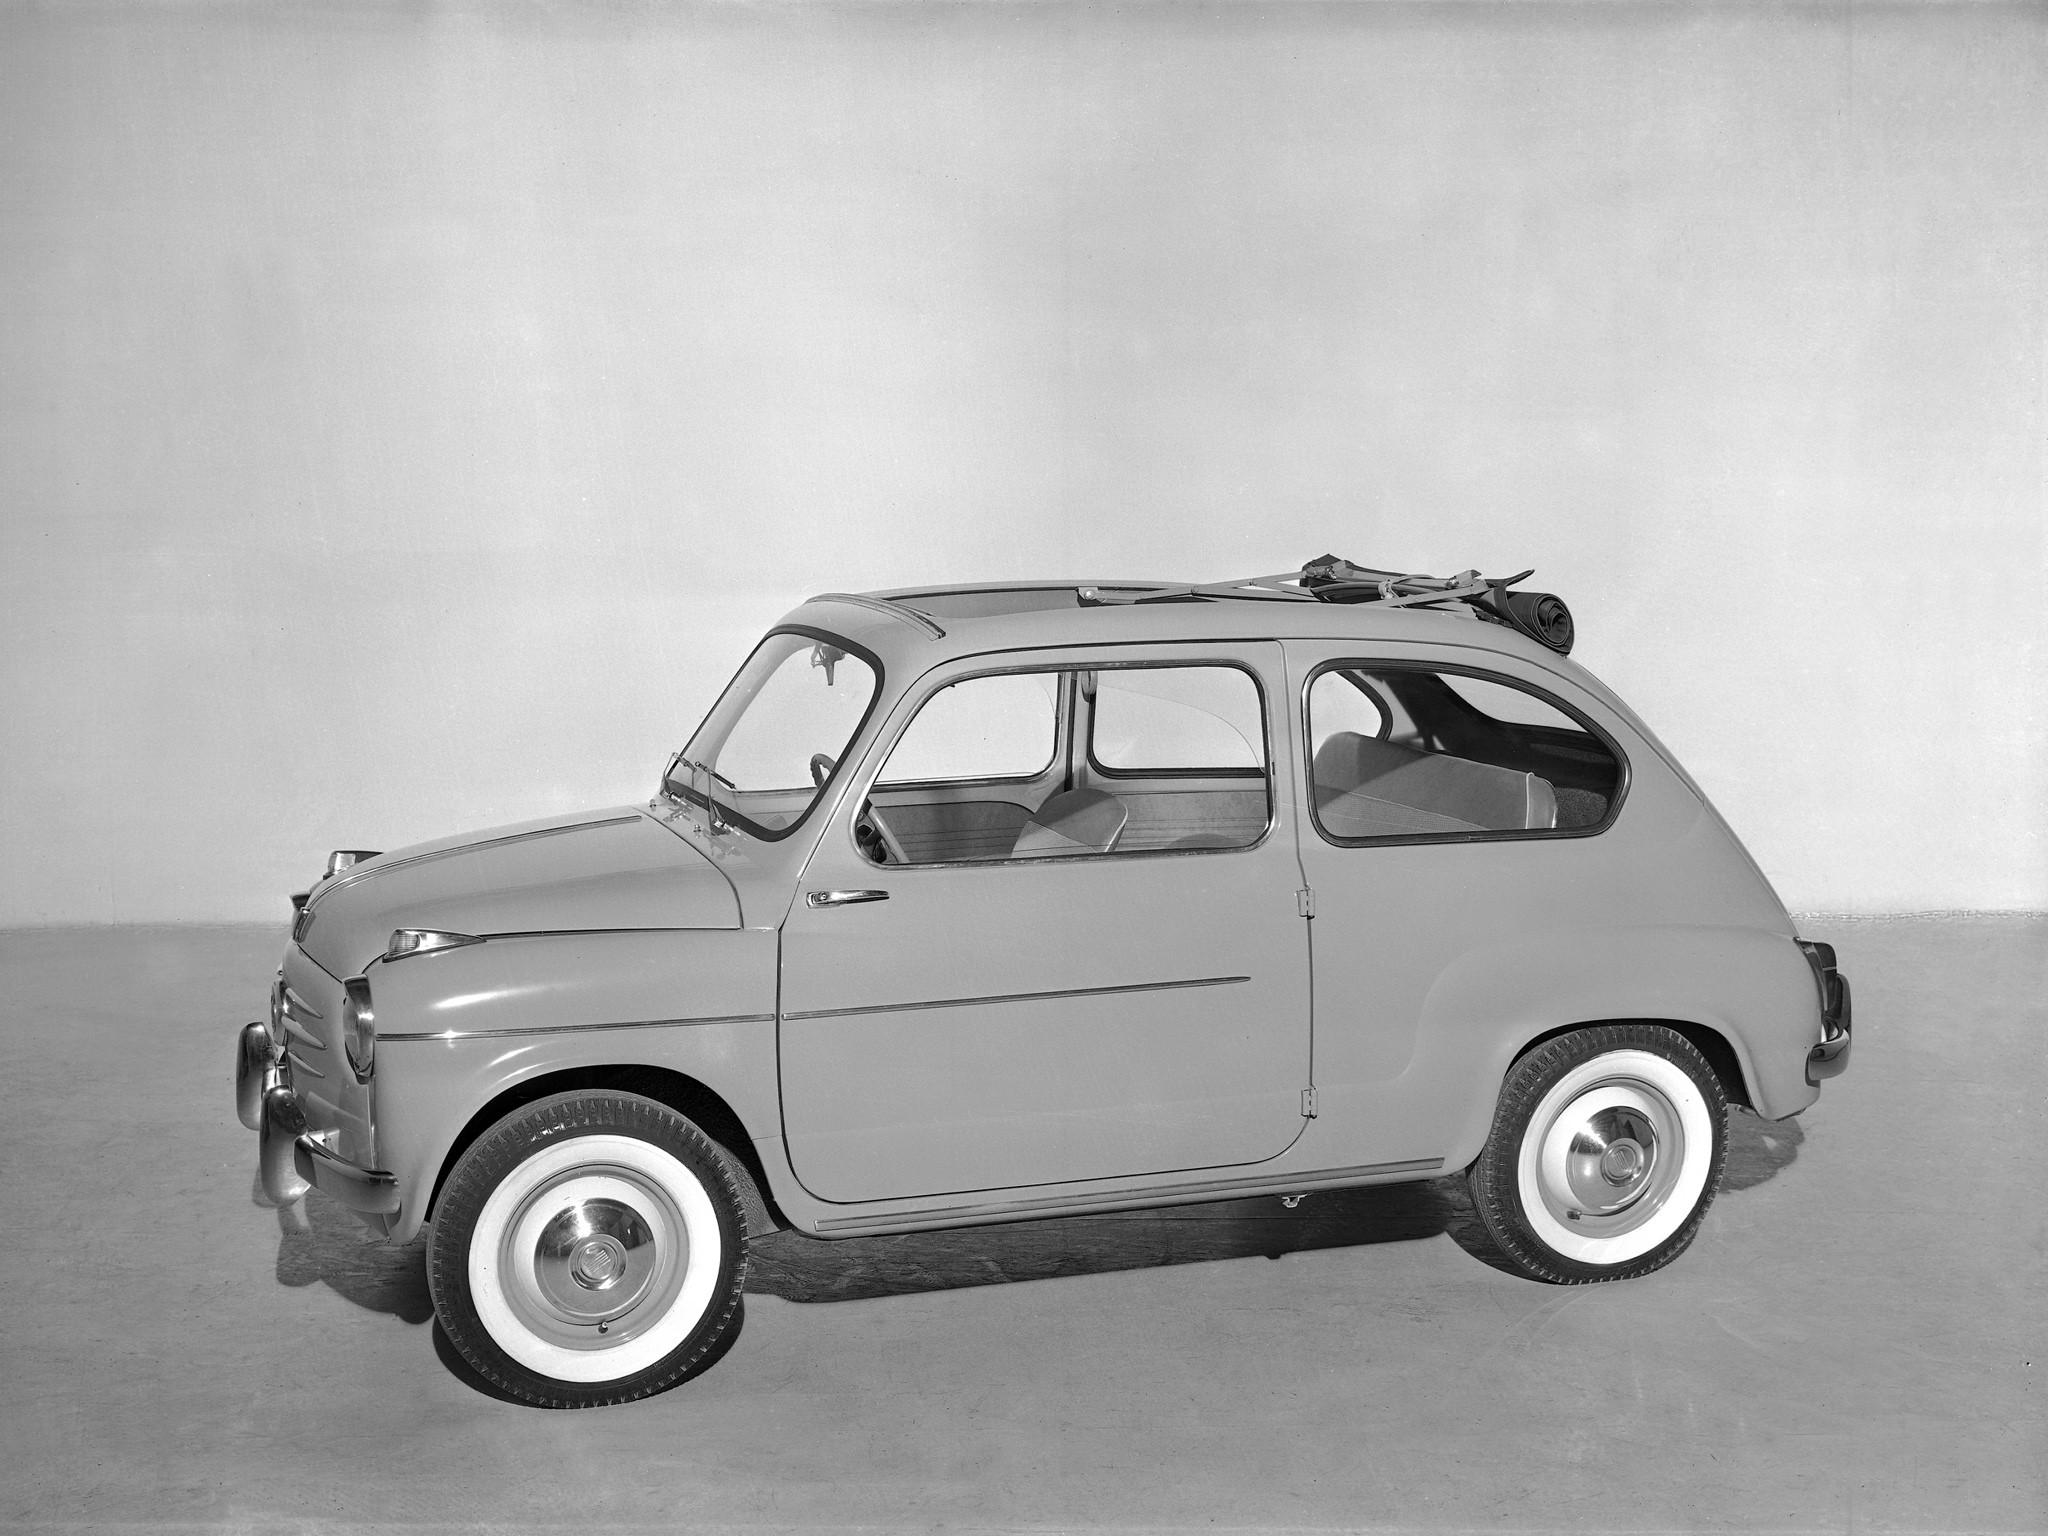 Fiat 600 D 1964 1965 1966 1967 1968 1969 Autoevolution